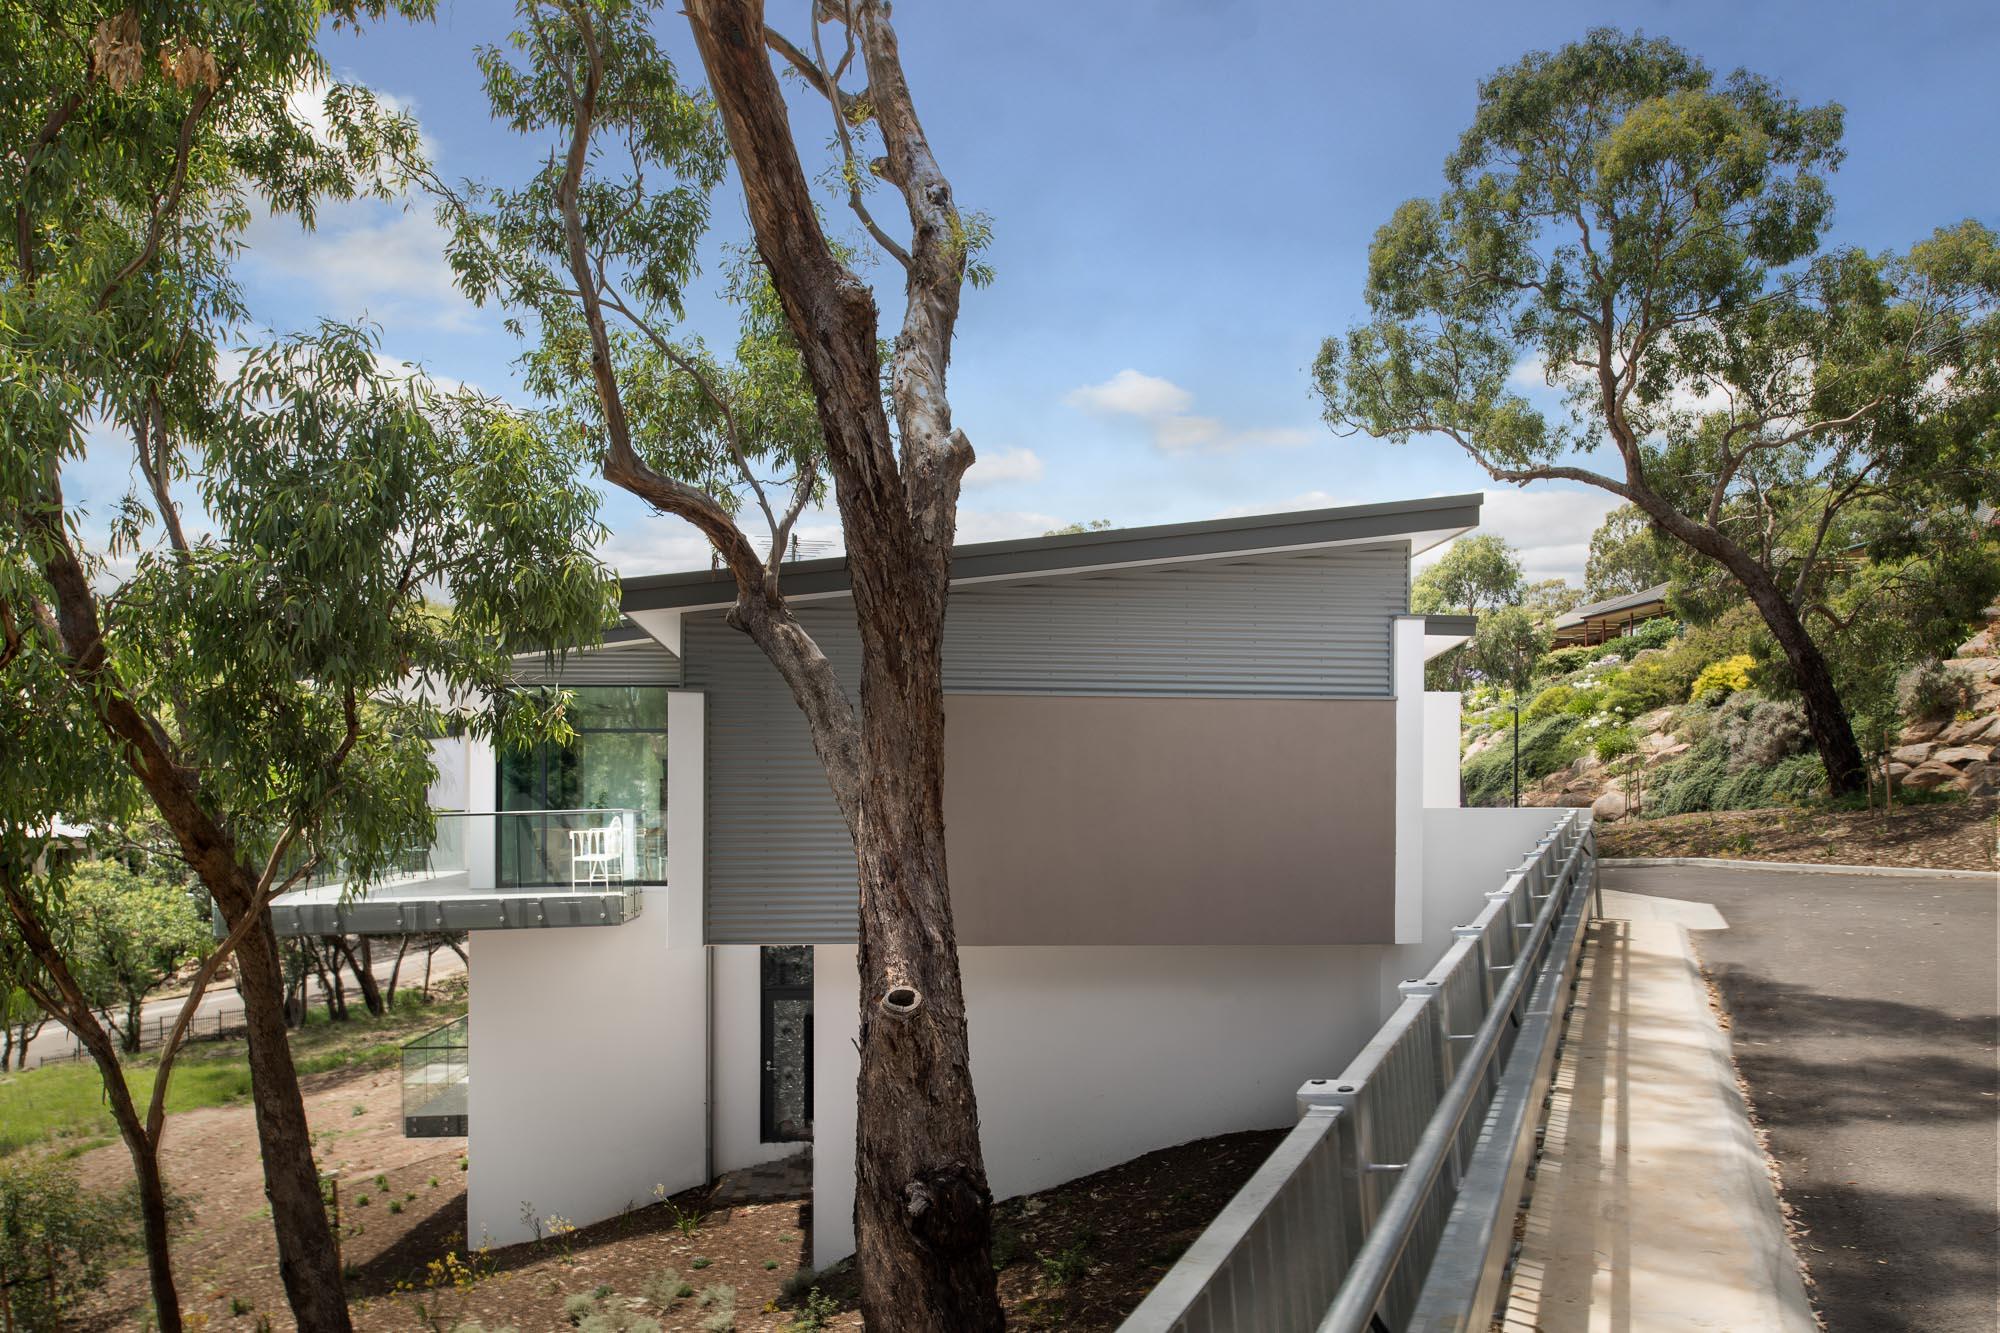 james brown memorial trust - kalyra heights village extension